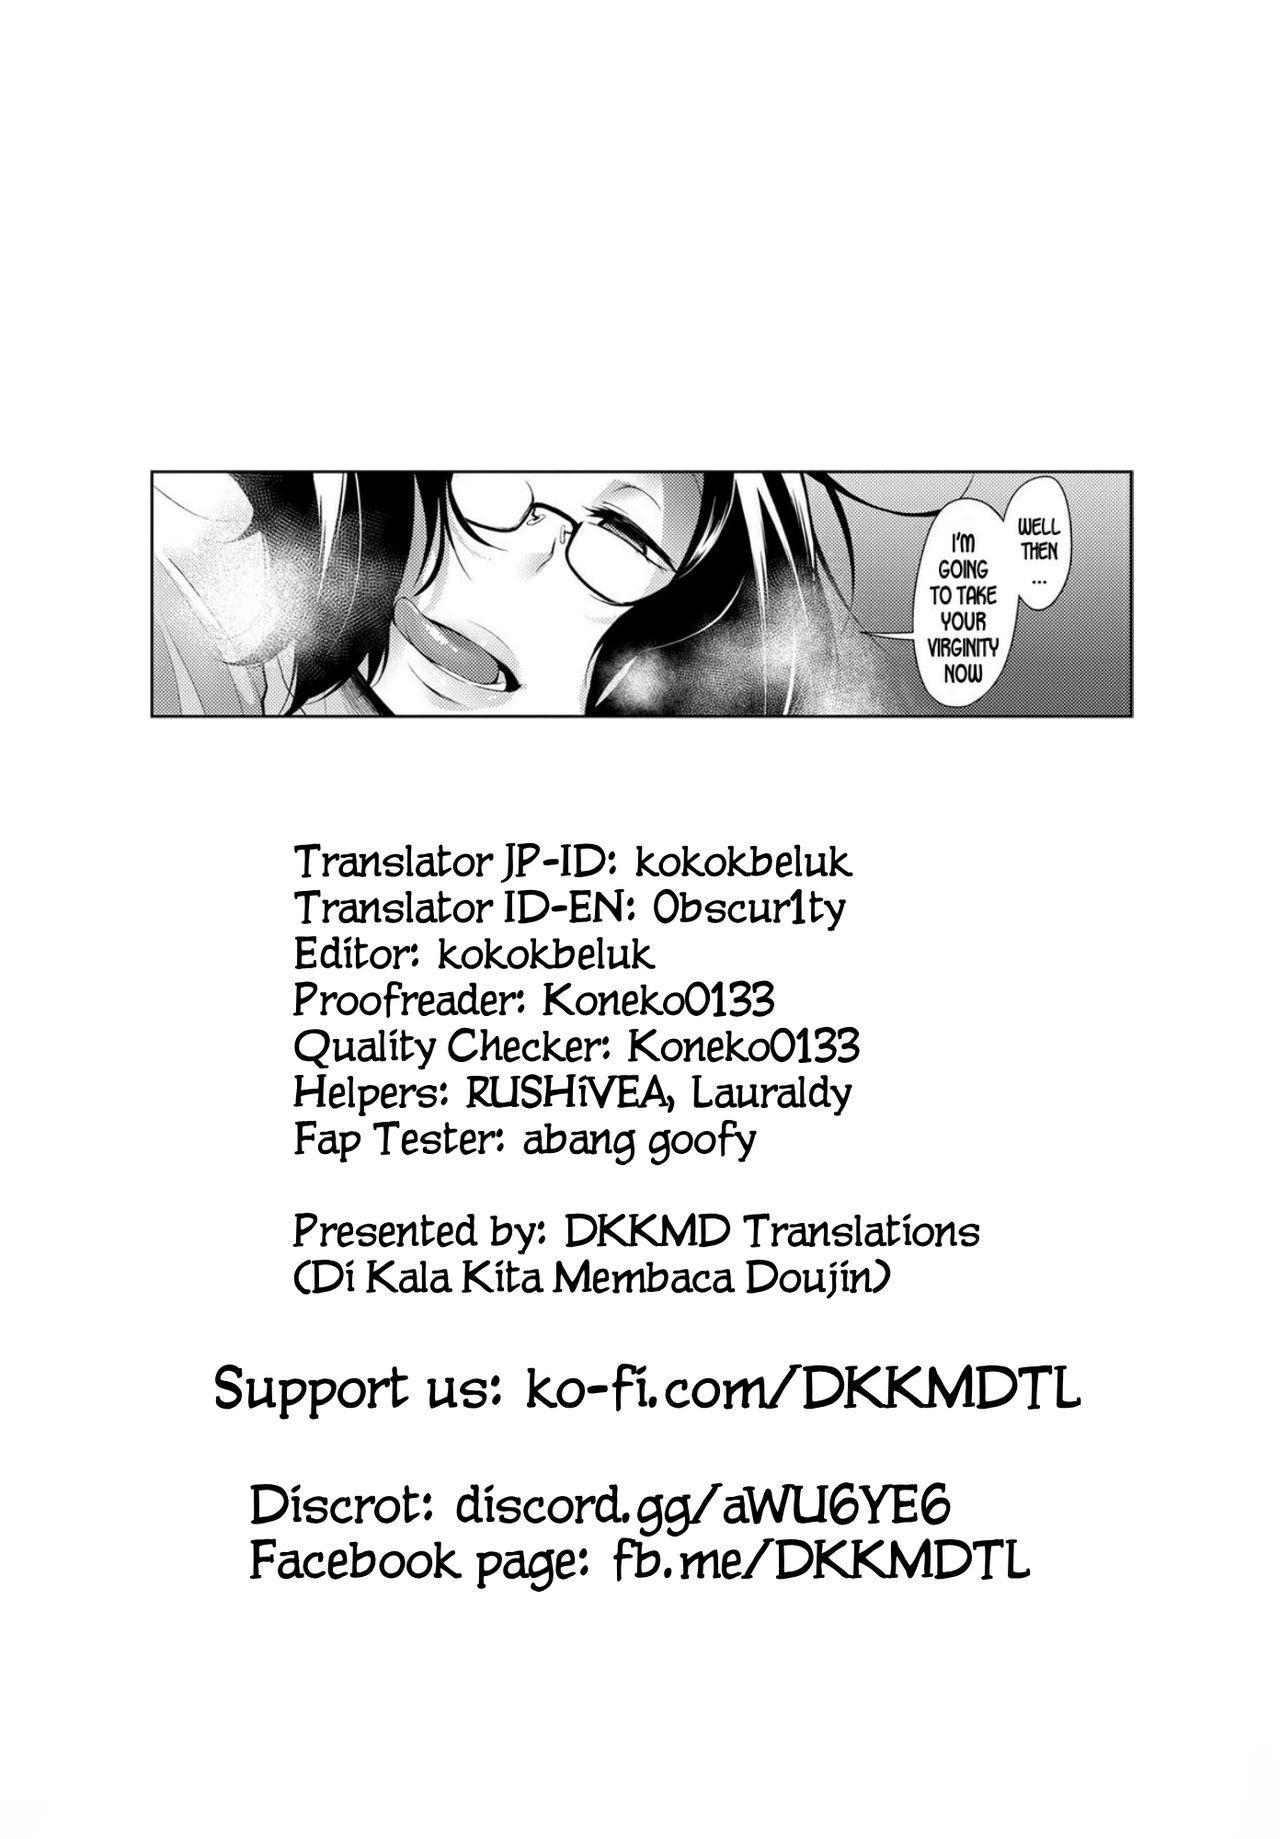 [Haguruma] Nekafe no Omogami-San | Omogami-san at the Net-Cafe (COMIC Anthurium 2018-02) [English] [DKKMD Translations] [Digital] 22